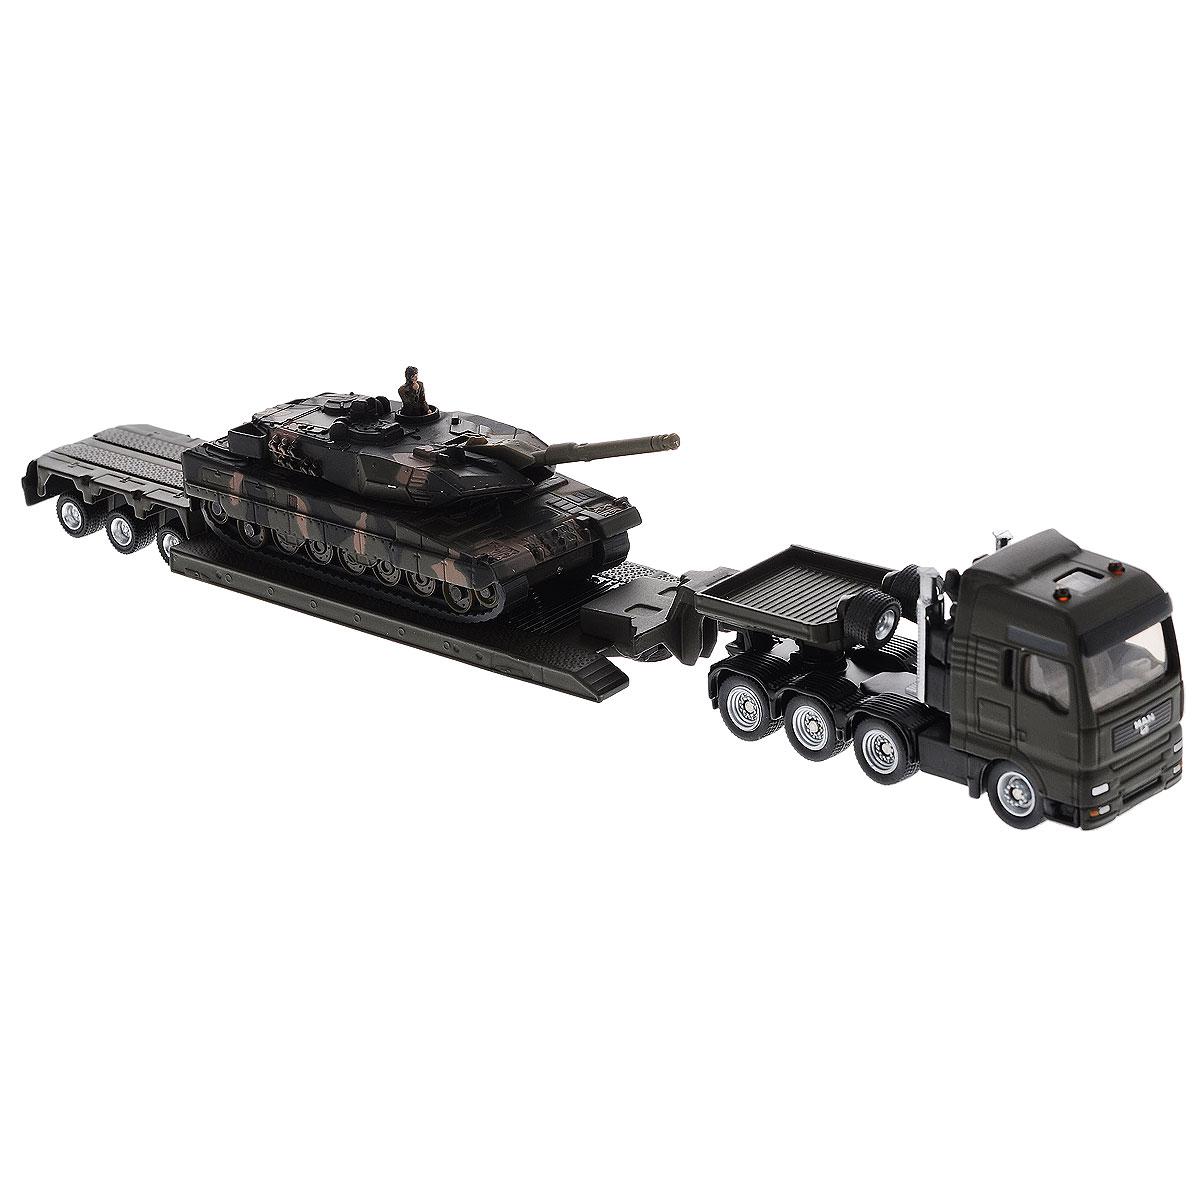 Siku Тягач MAN с танком на платформе siku тягач с катером